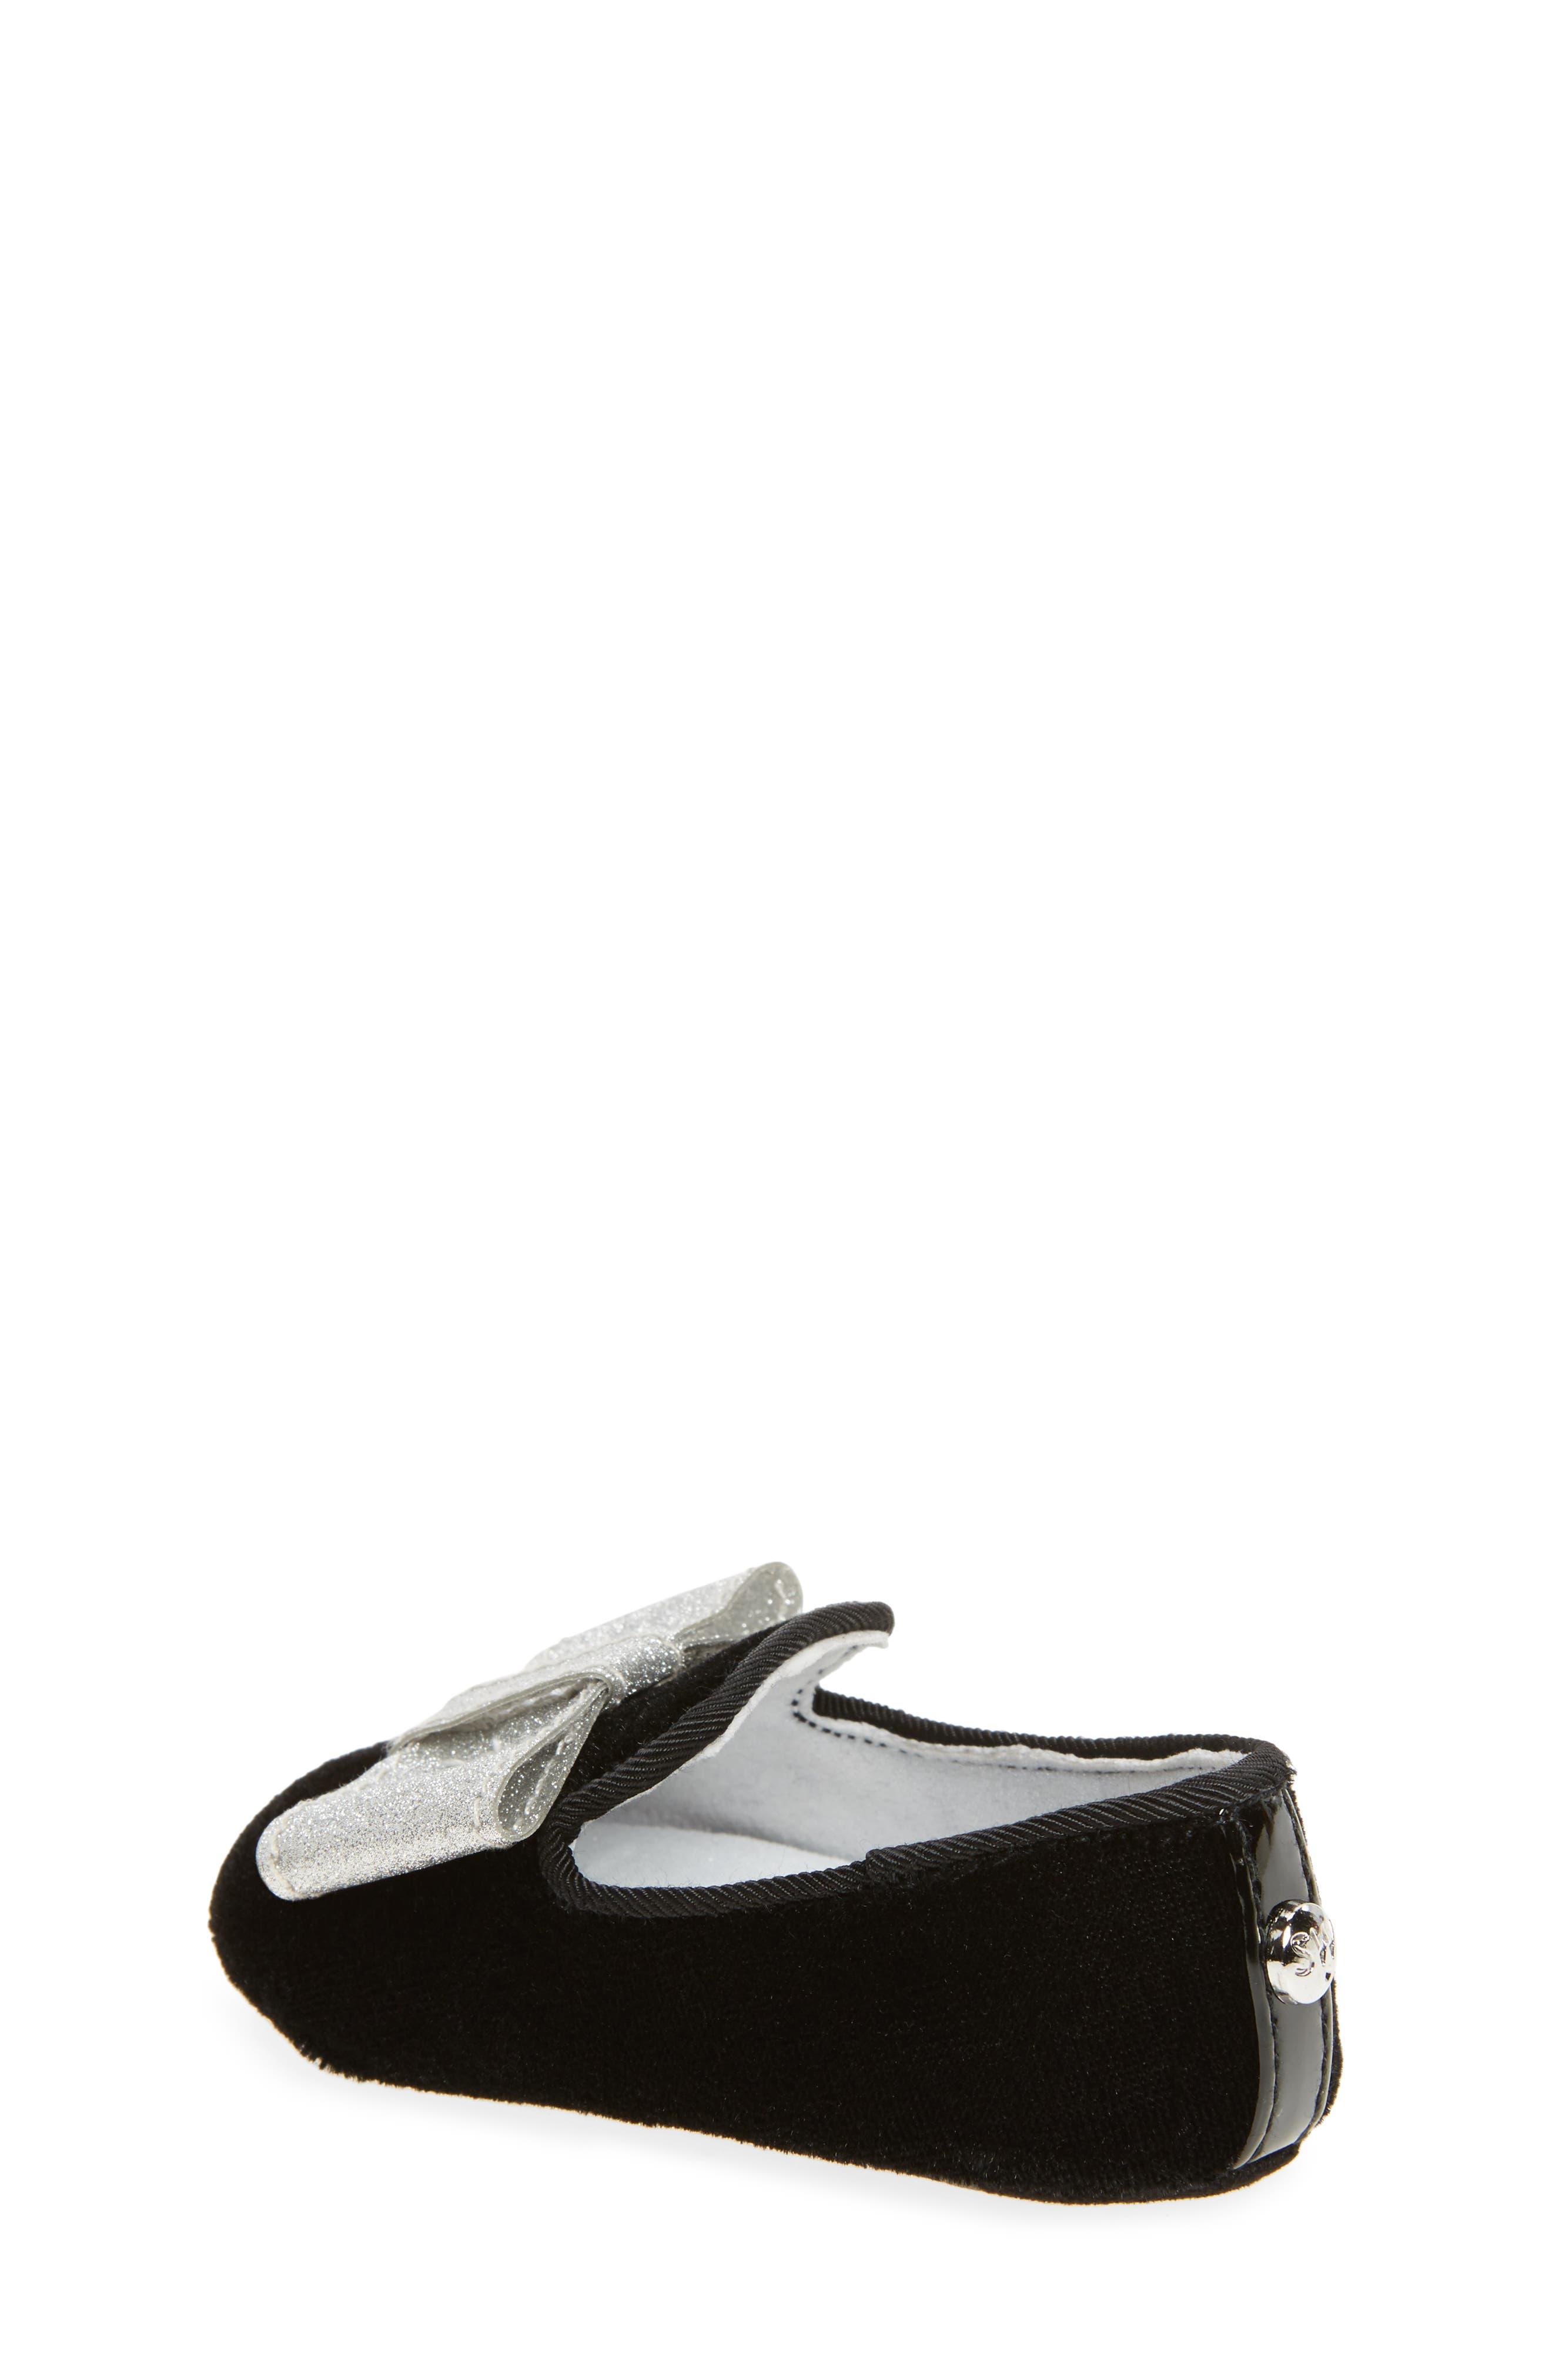 Bow Loafer Crib Shoe,                             Alternate thumbnail 2, color,                             012